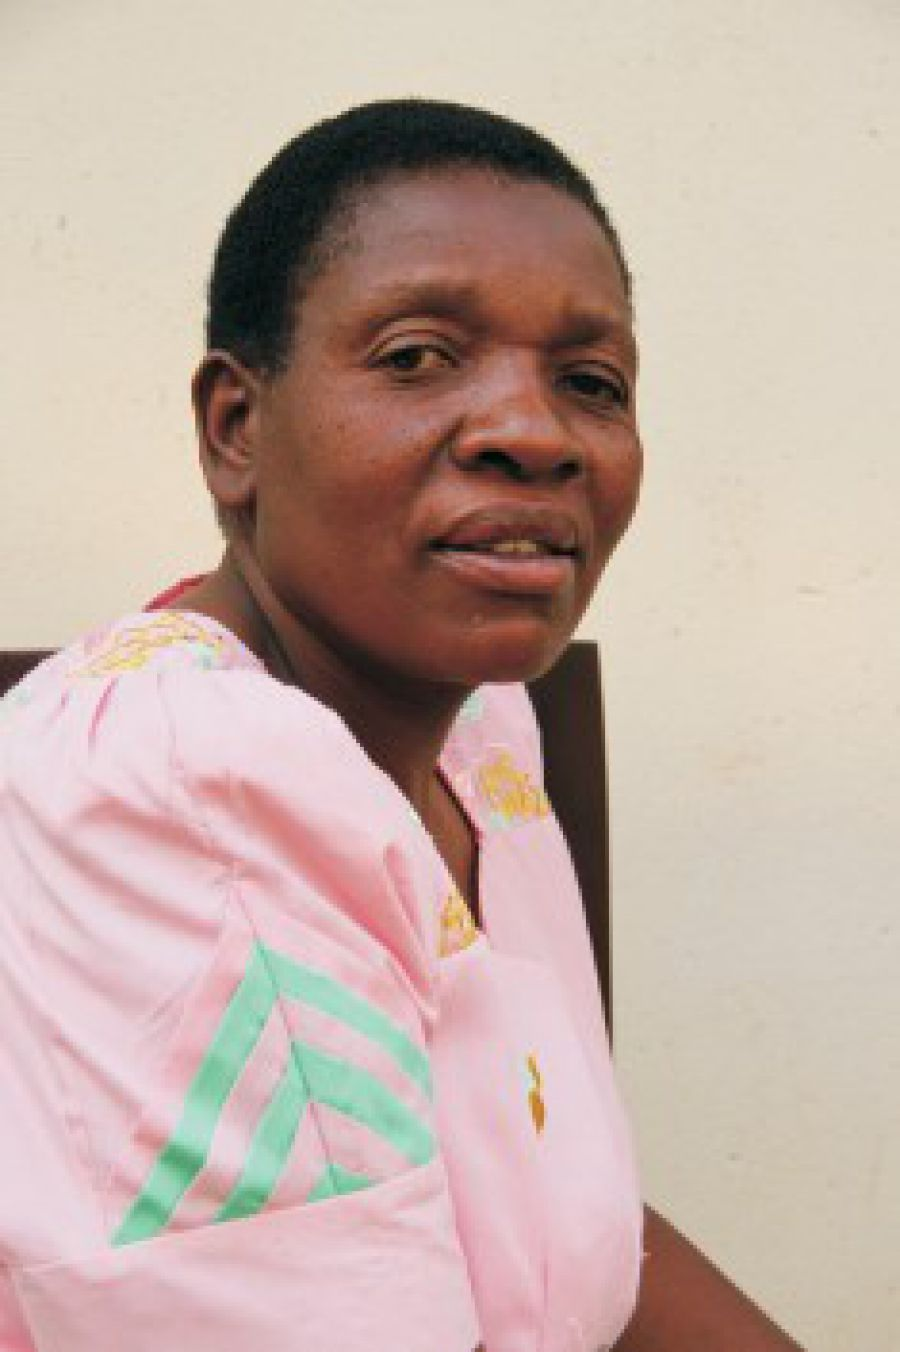 Sithemba Gumbo